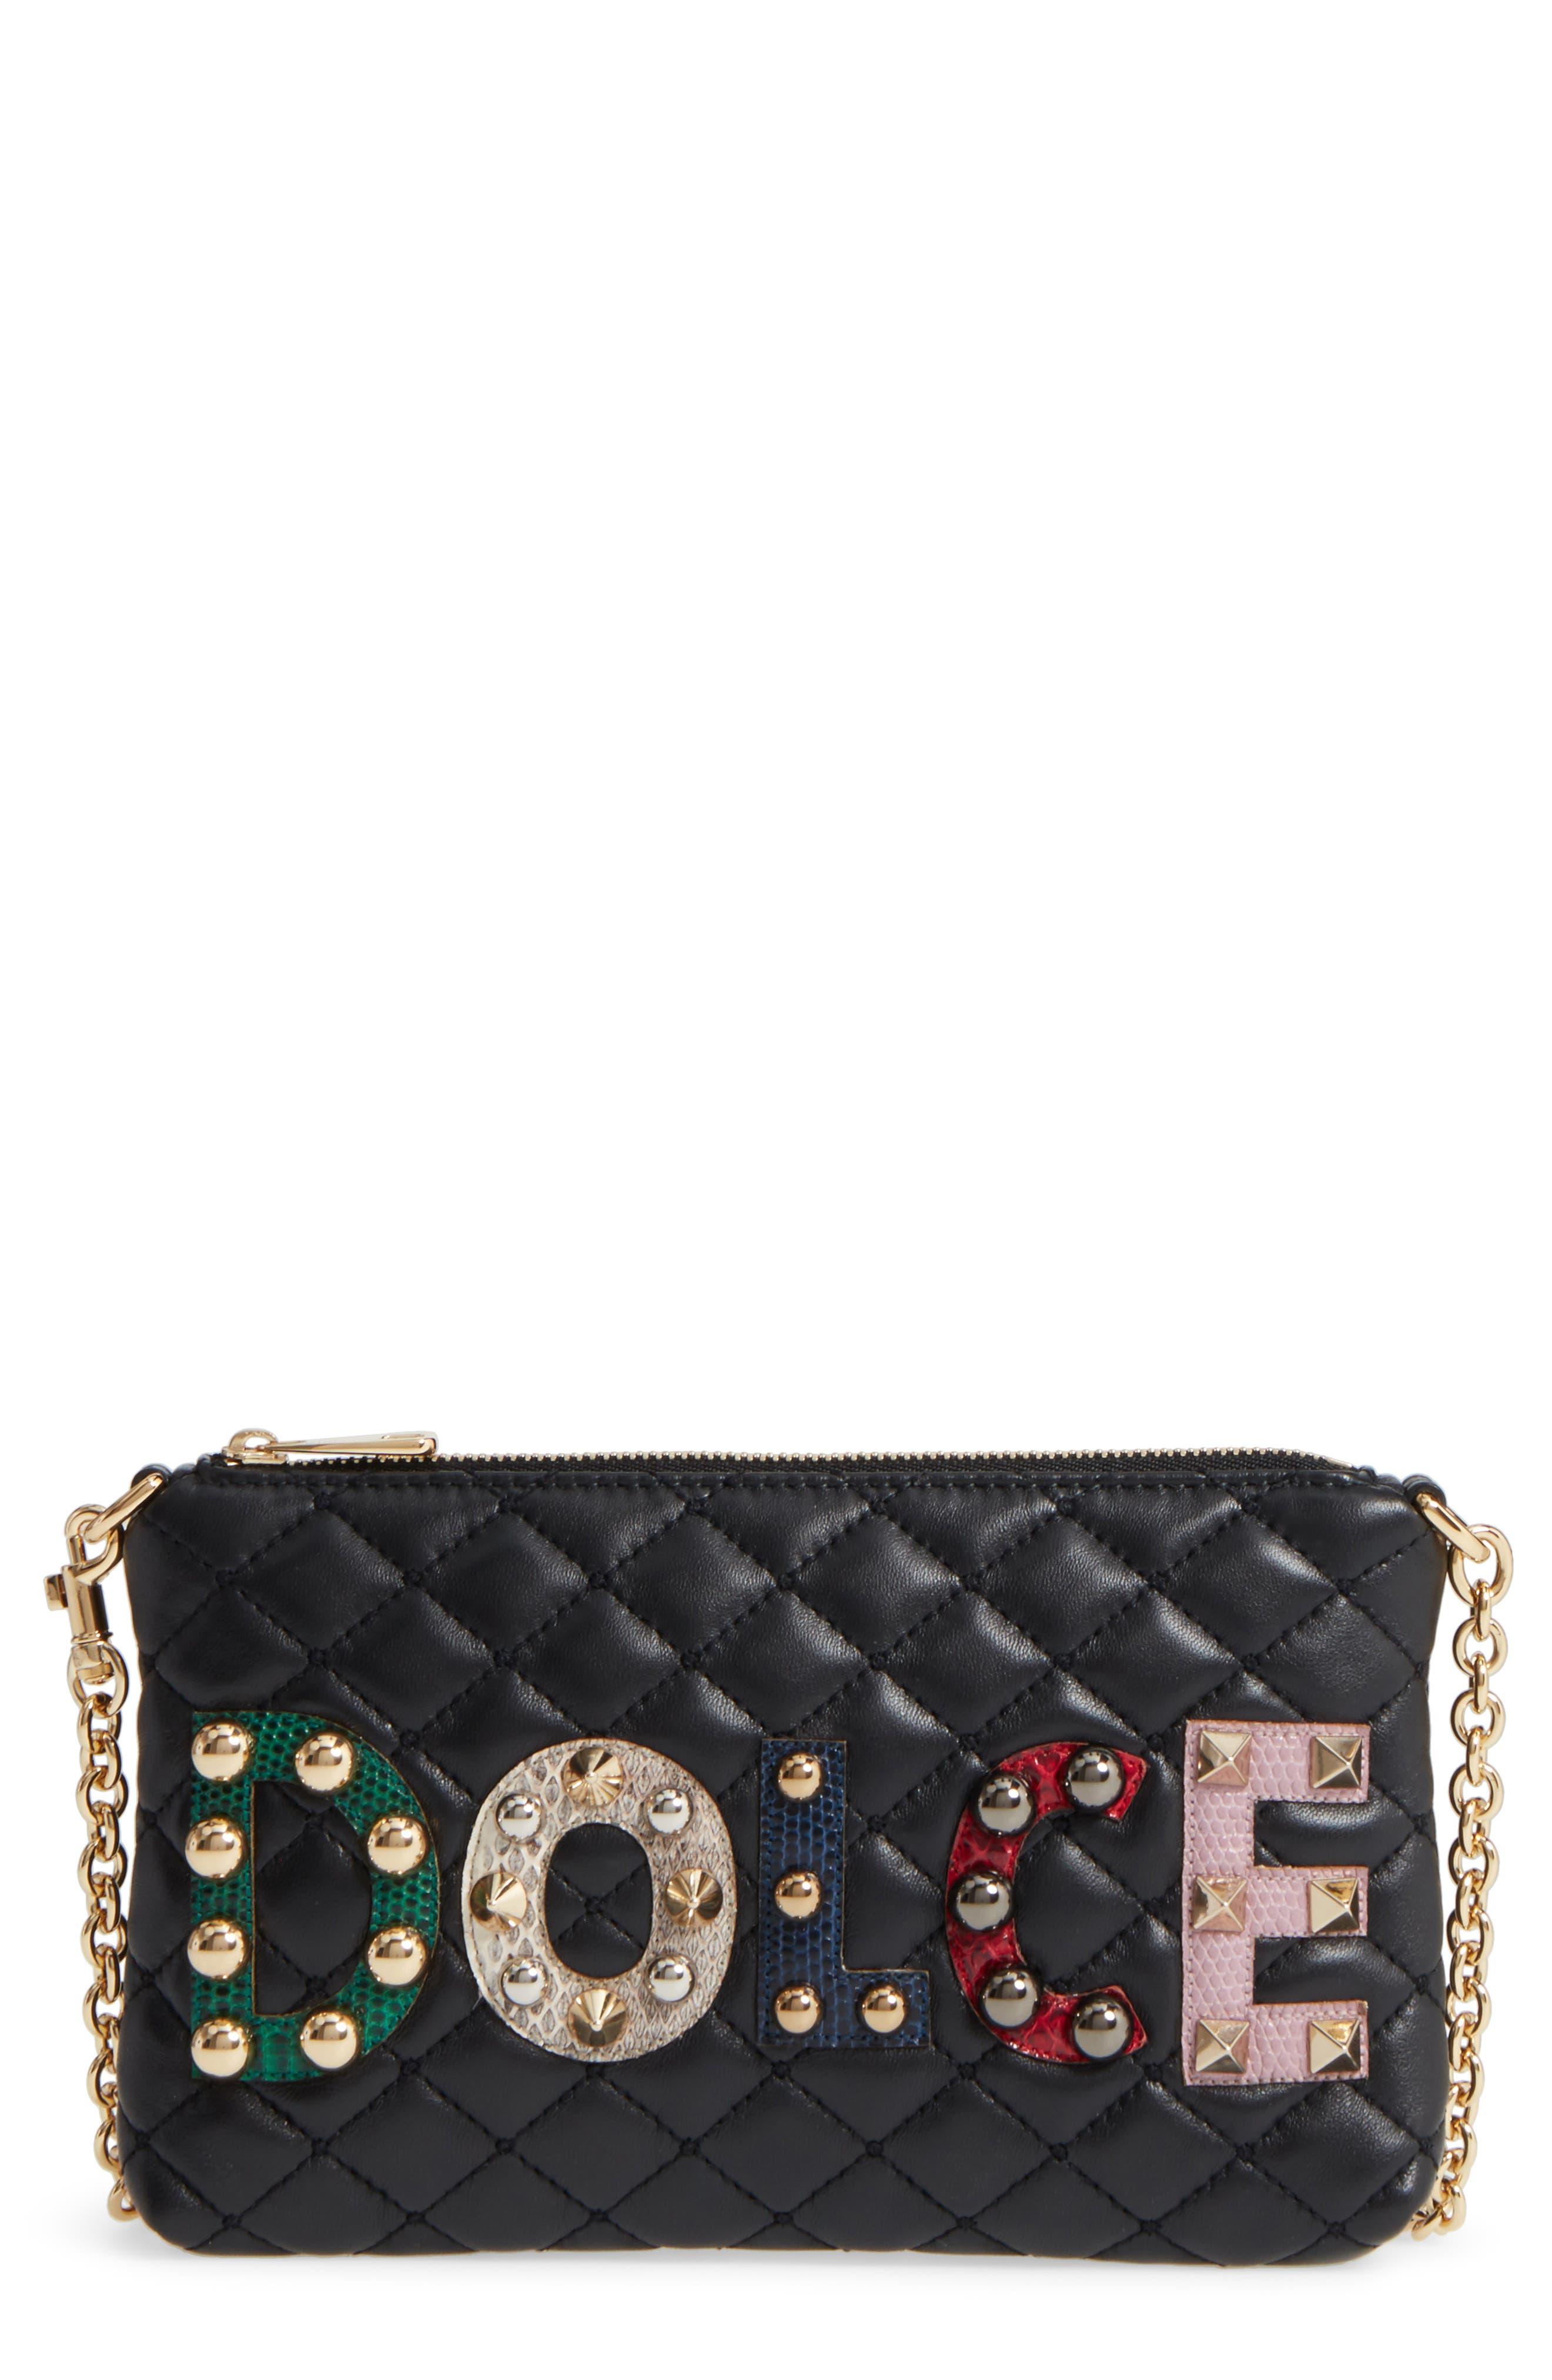 Dolce&Gabbana Studded Logo Patch Leather and Genuine Snakeskin Bag